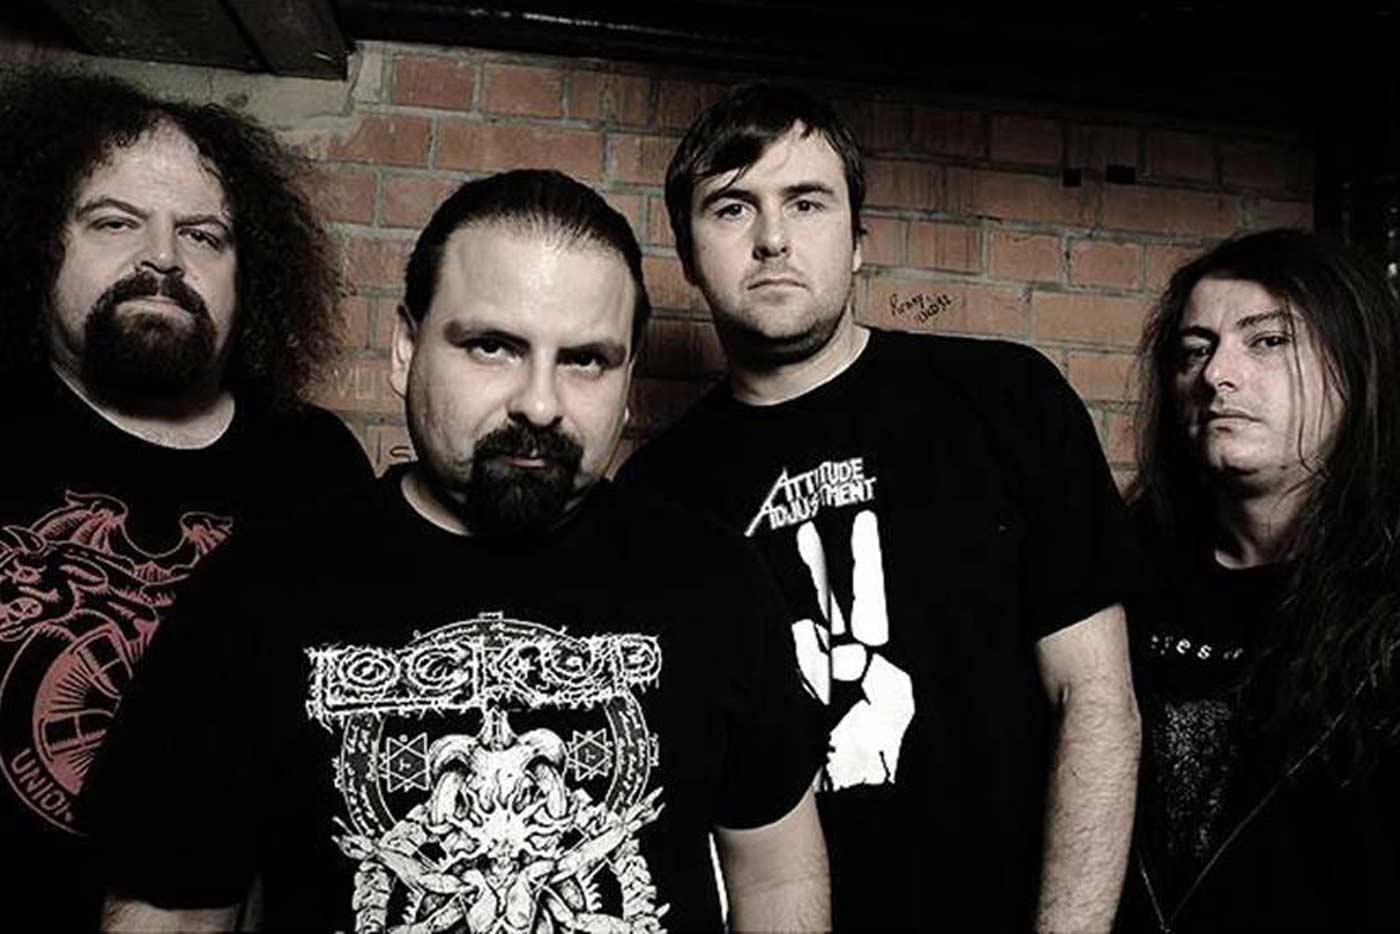 La gira de Napalm Death llega hoy a Vitoria-Gasteiz